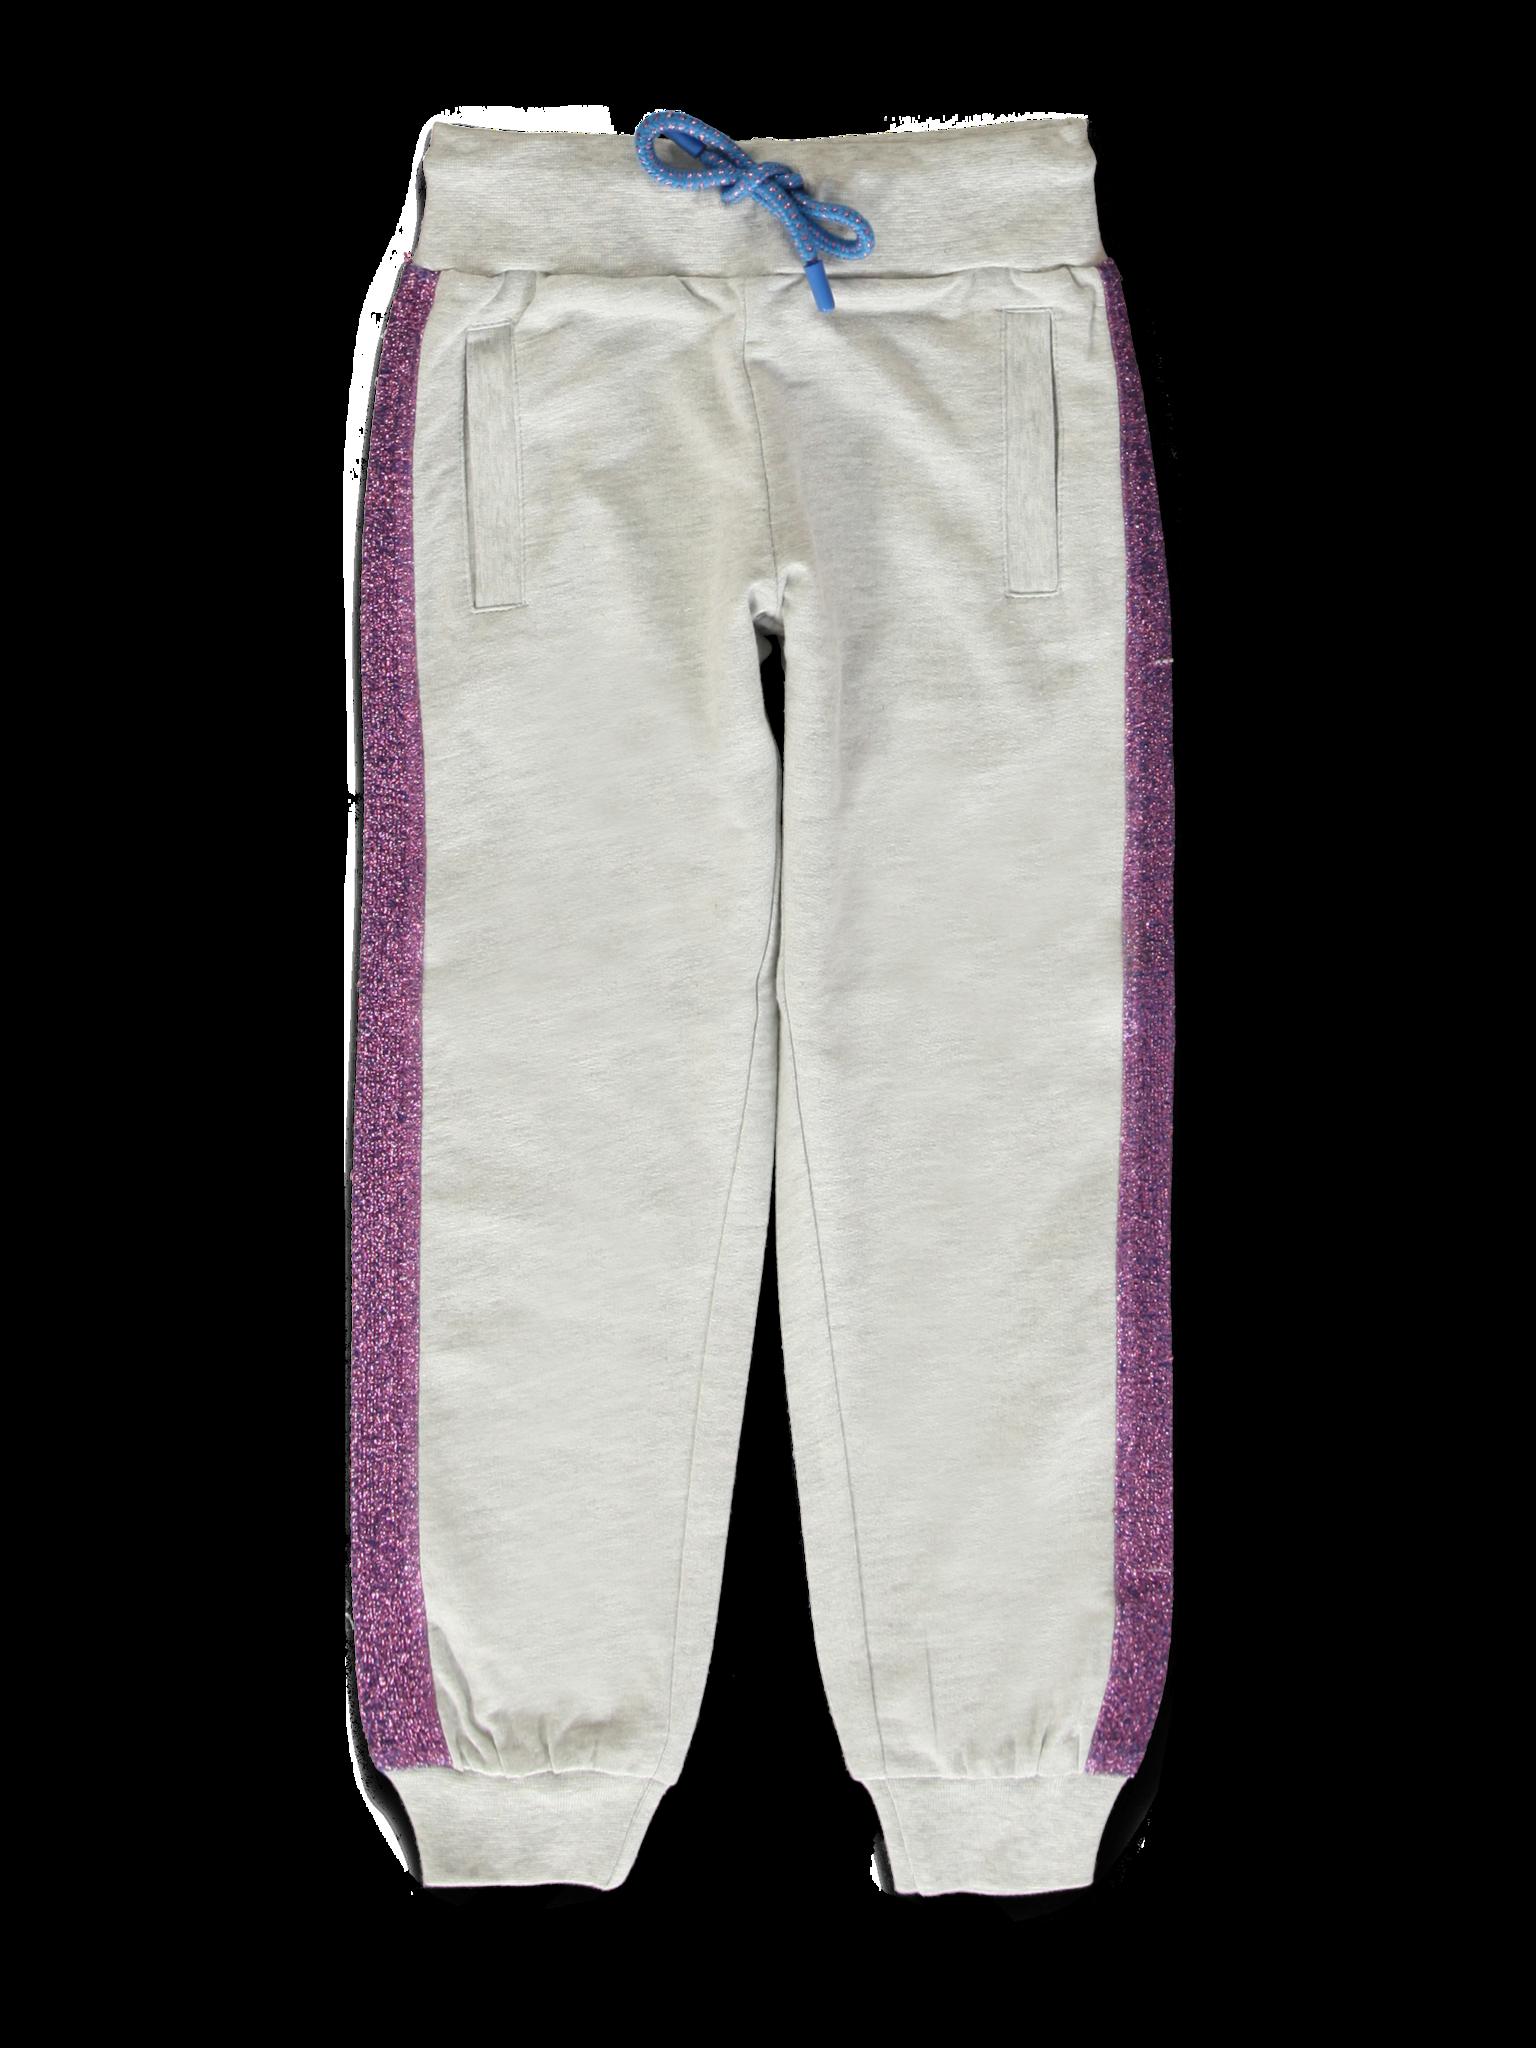 All Brands | Summerproducts Small Girls | Jogging Pant | 12 pcs/box